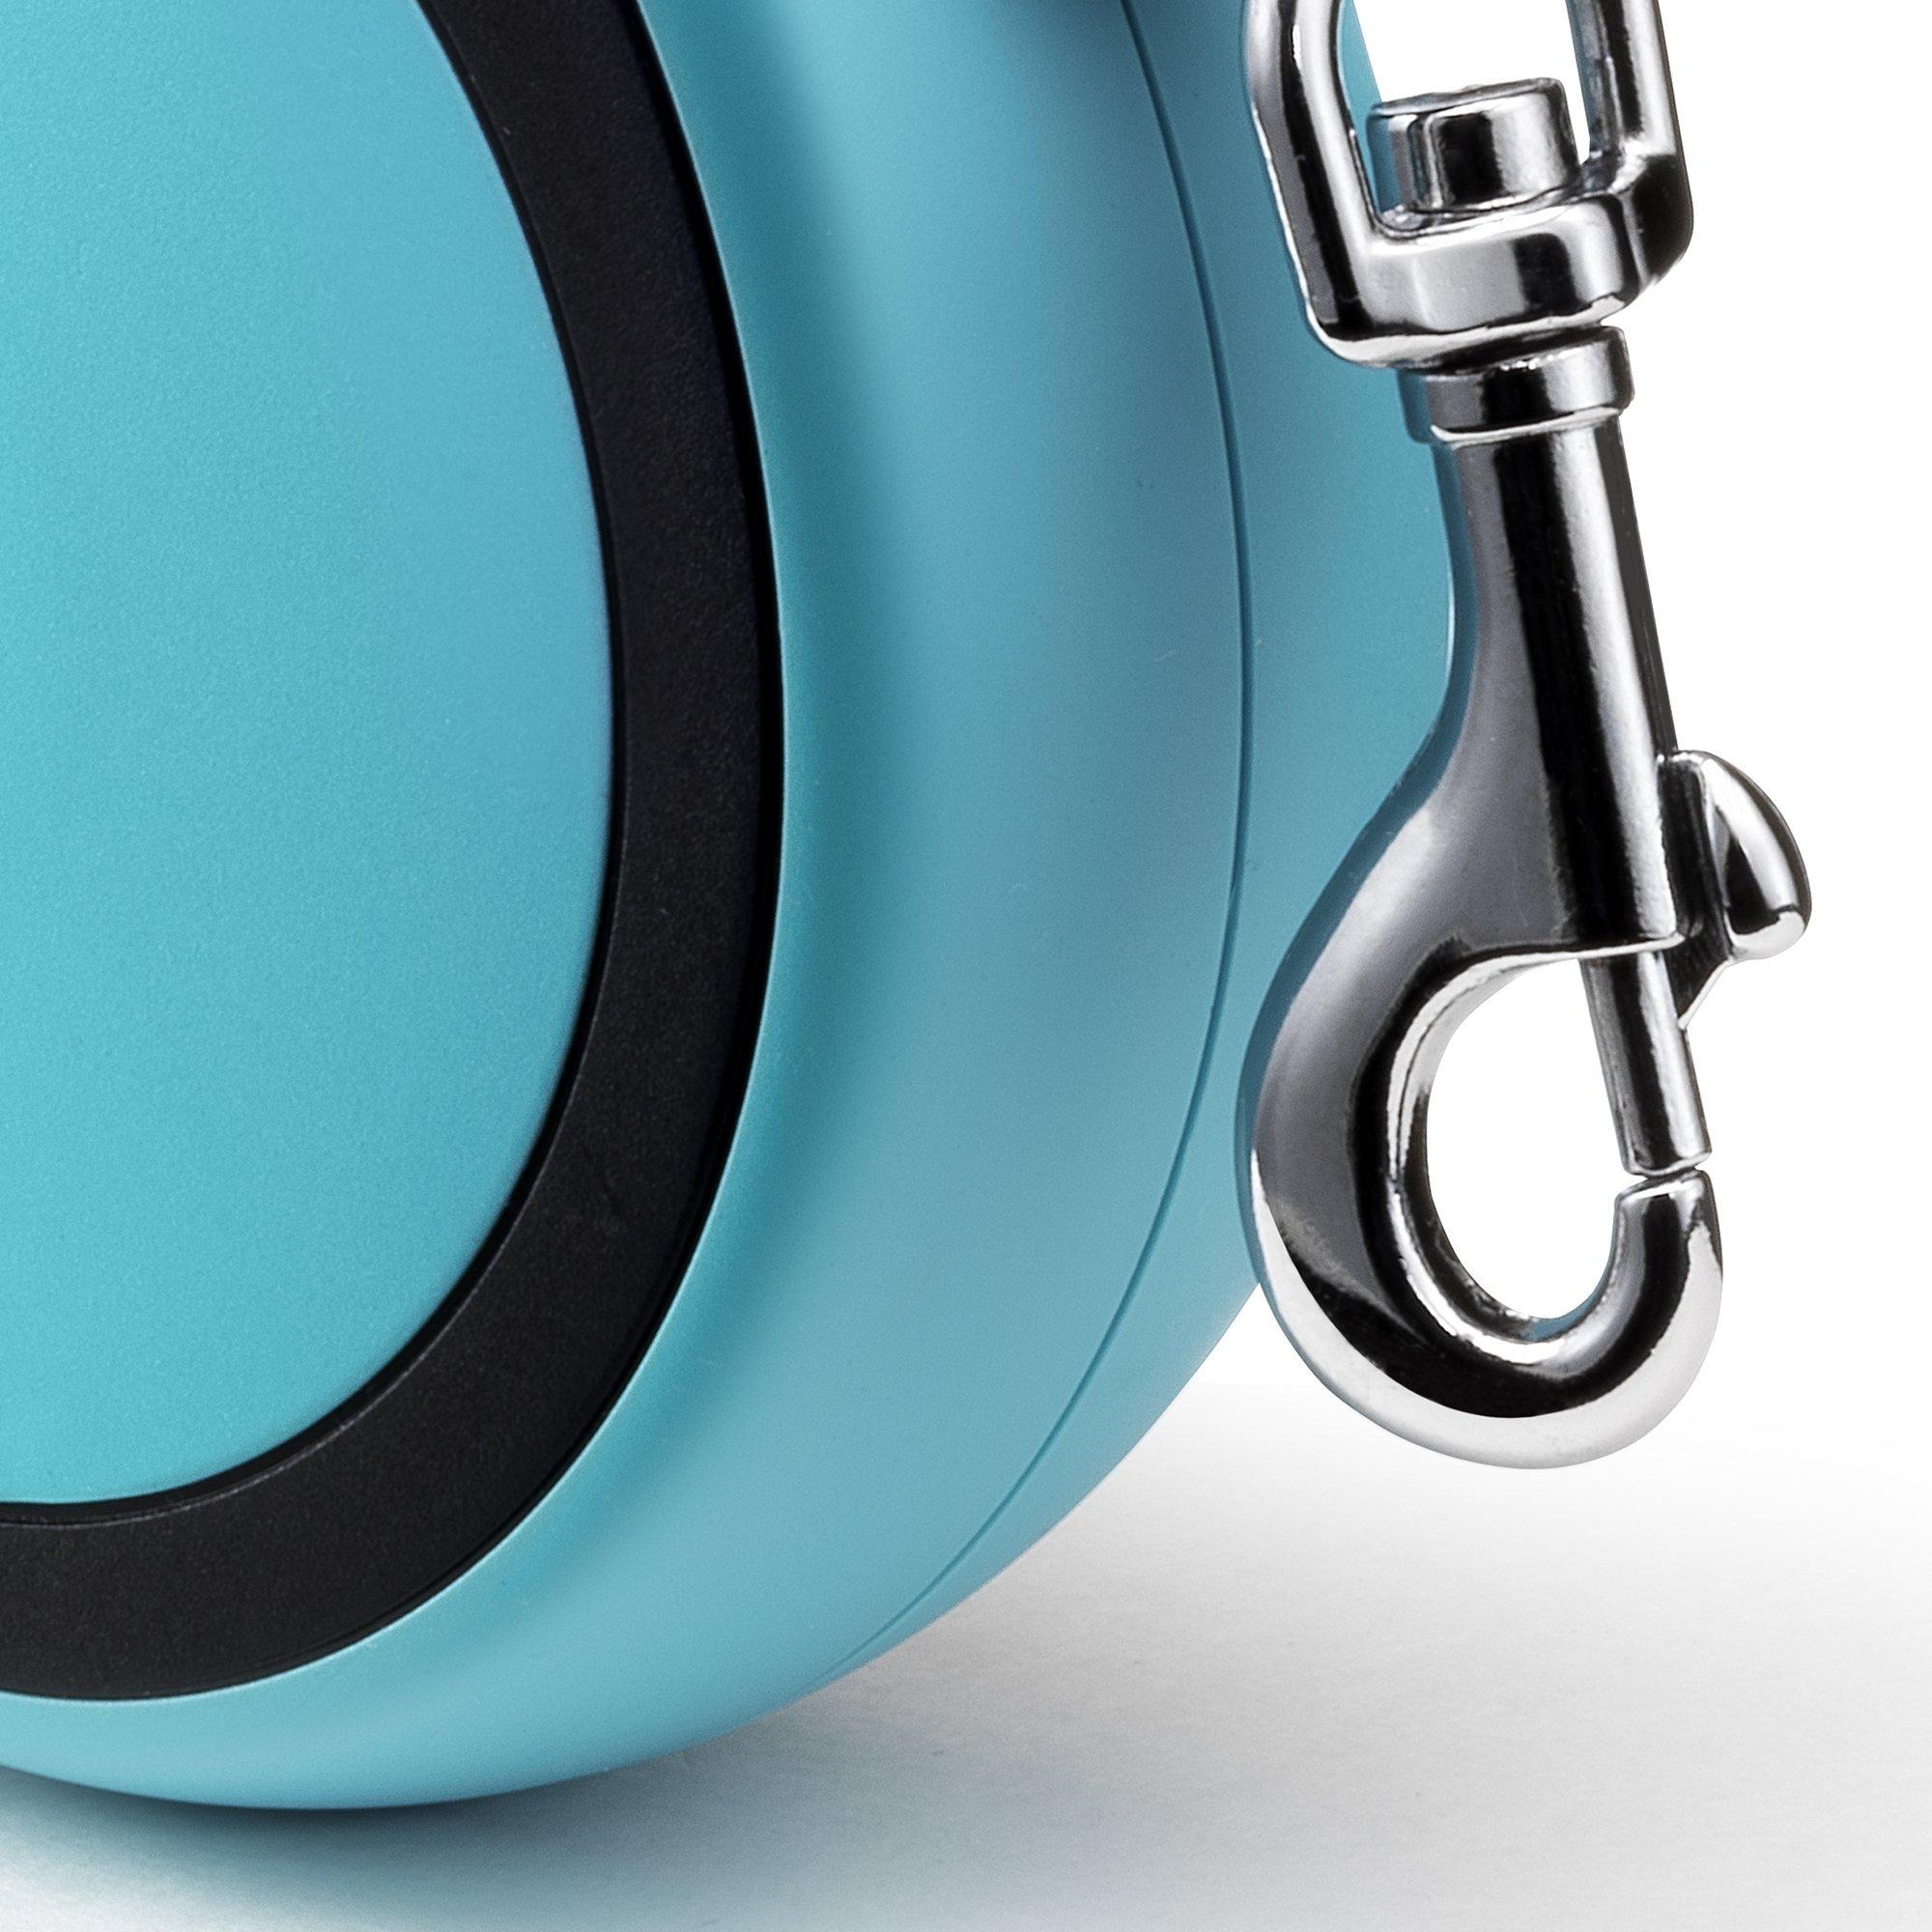 Flexi New Comfort Retractable Dog Leash (Tape), 16 ft, Medium, Blue by Flexi (Image #4)